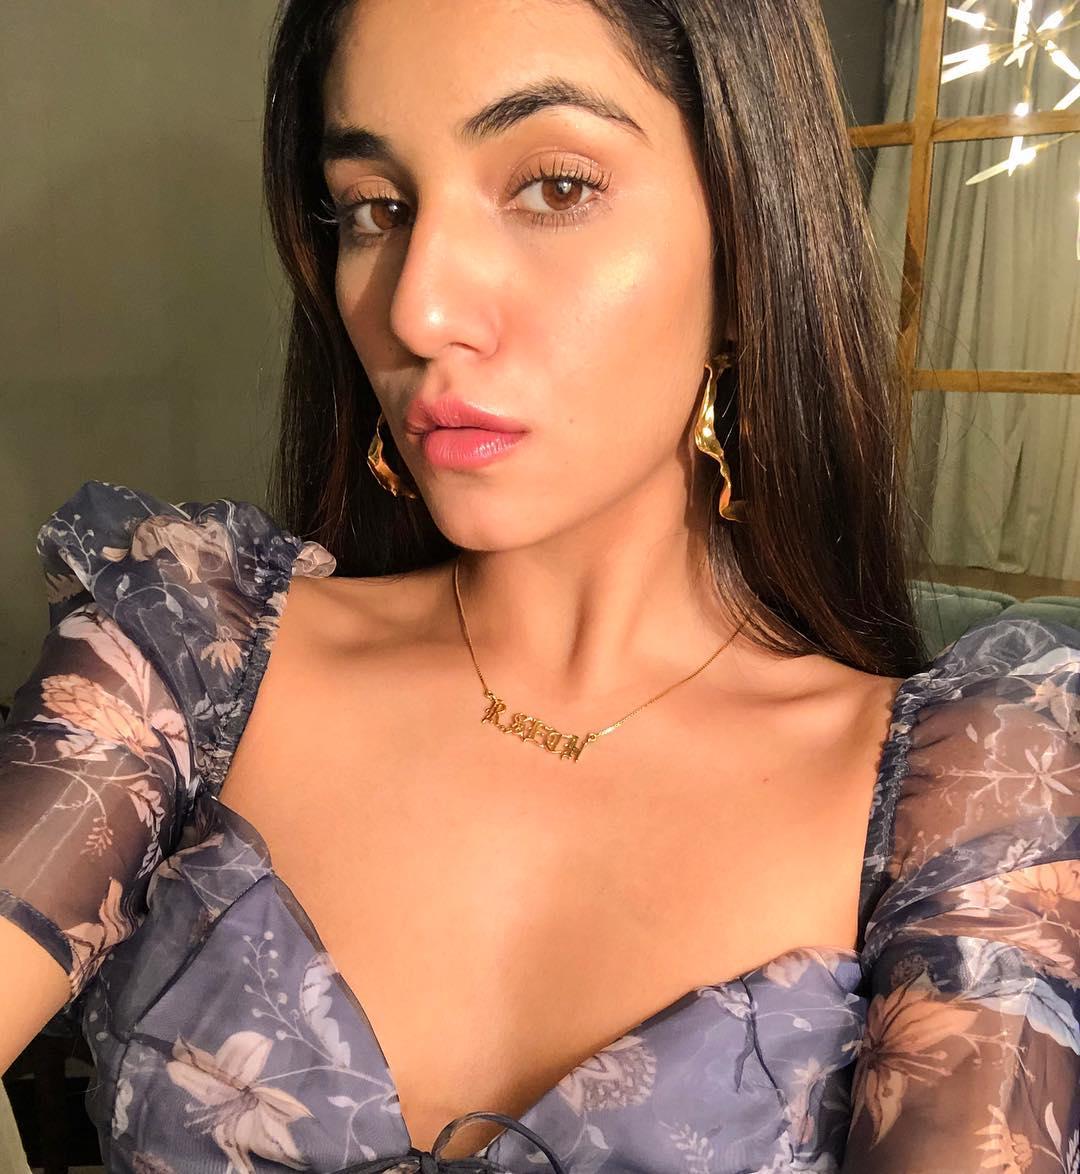 Radhika Seth hot, Radhika Seth nude, Radhika Seth instagram, radhika sethi exy bikini pics, radhika instagram hot, radhika seth age